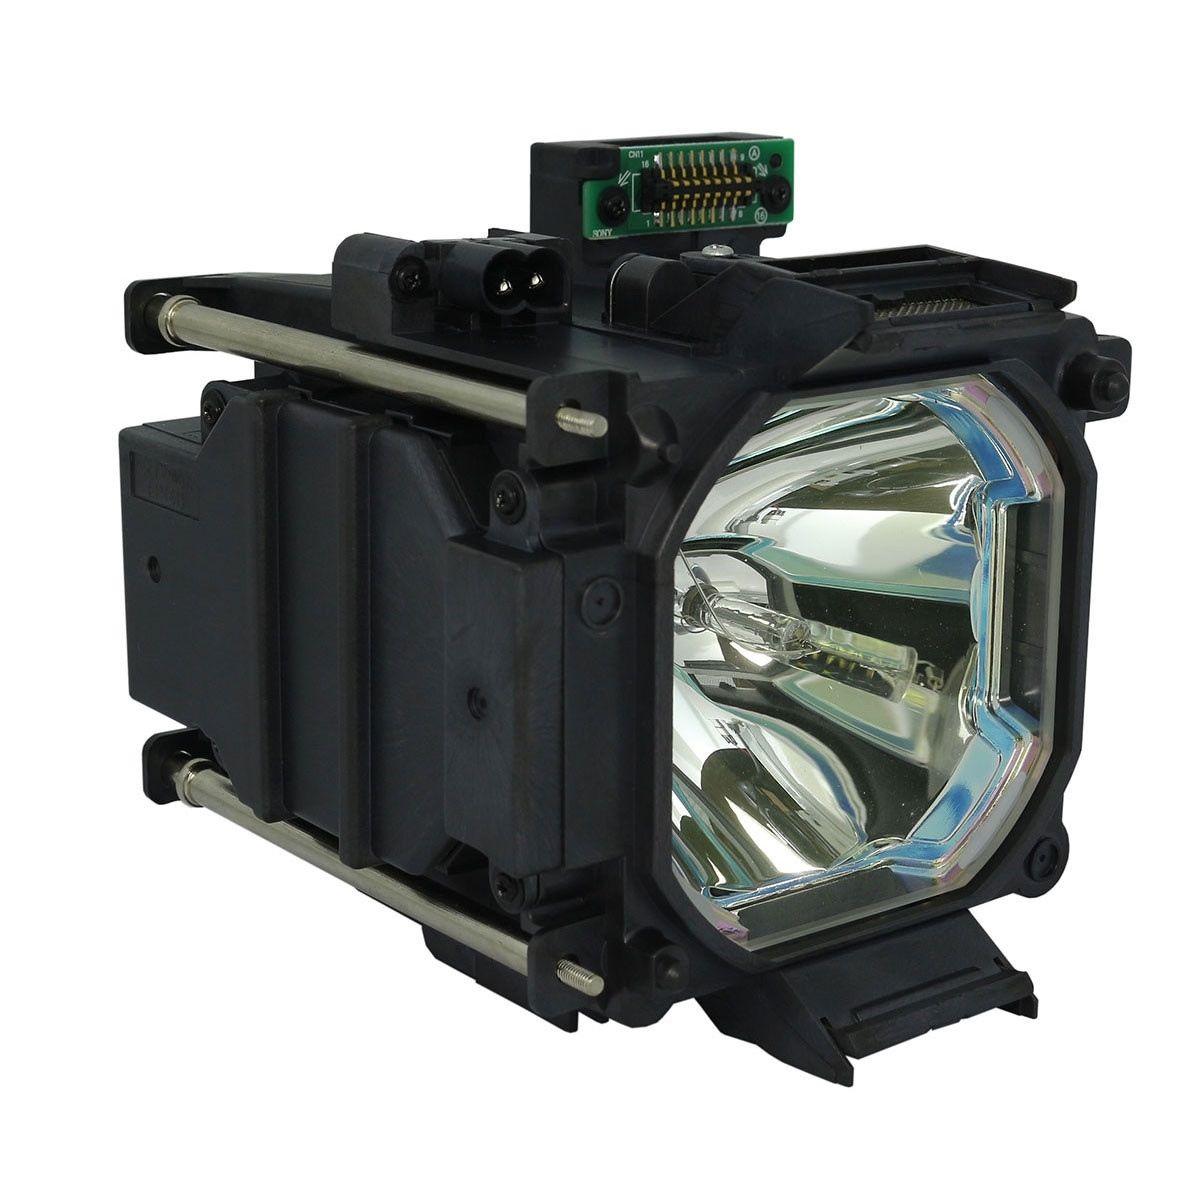 LMP-F330 LMPF330 para Sony VPL-FH500L VPL-FX500L VPL-F500H VPL-F700HL VPL-F700XL bombilla de proyector con carcasa